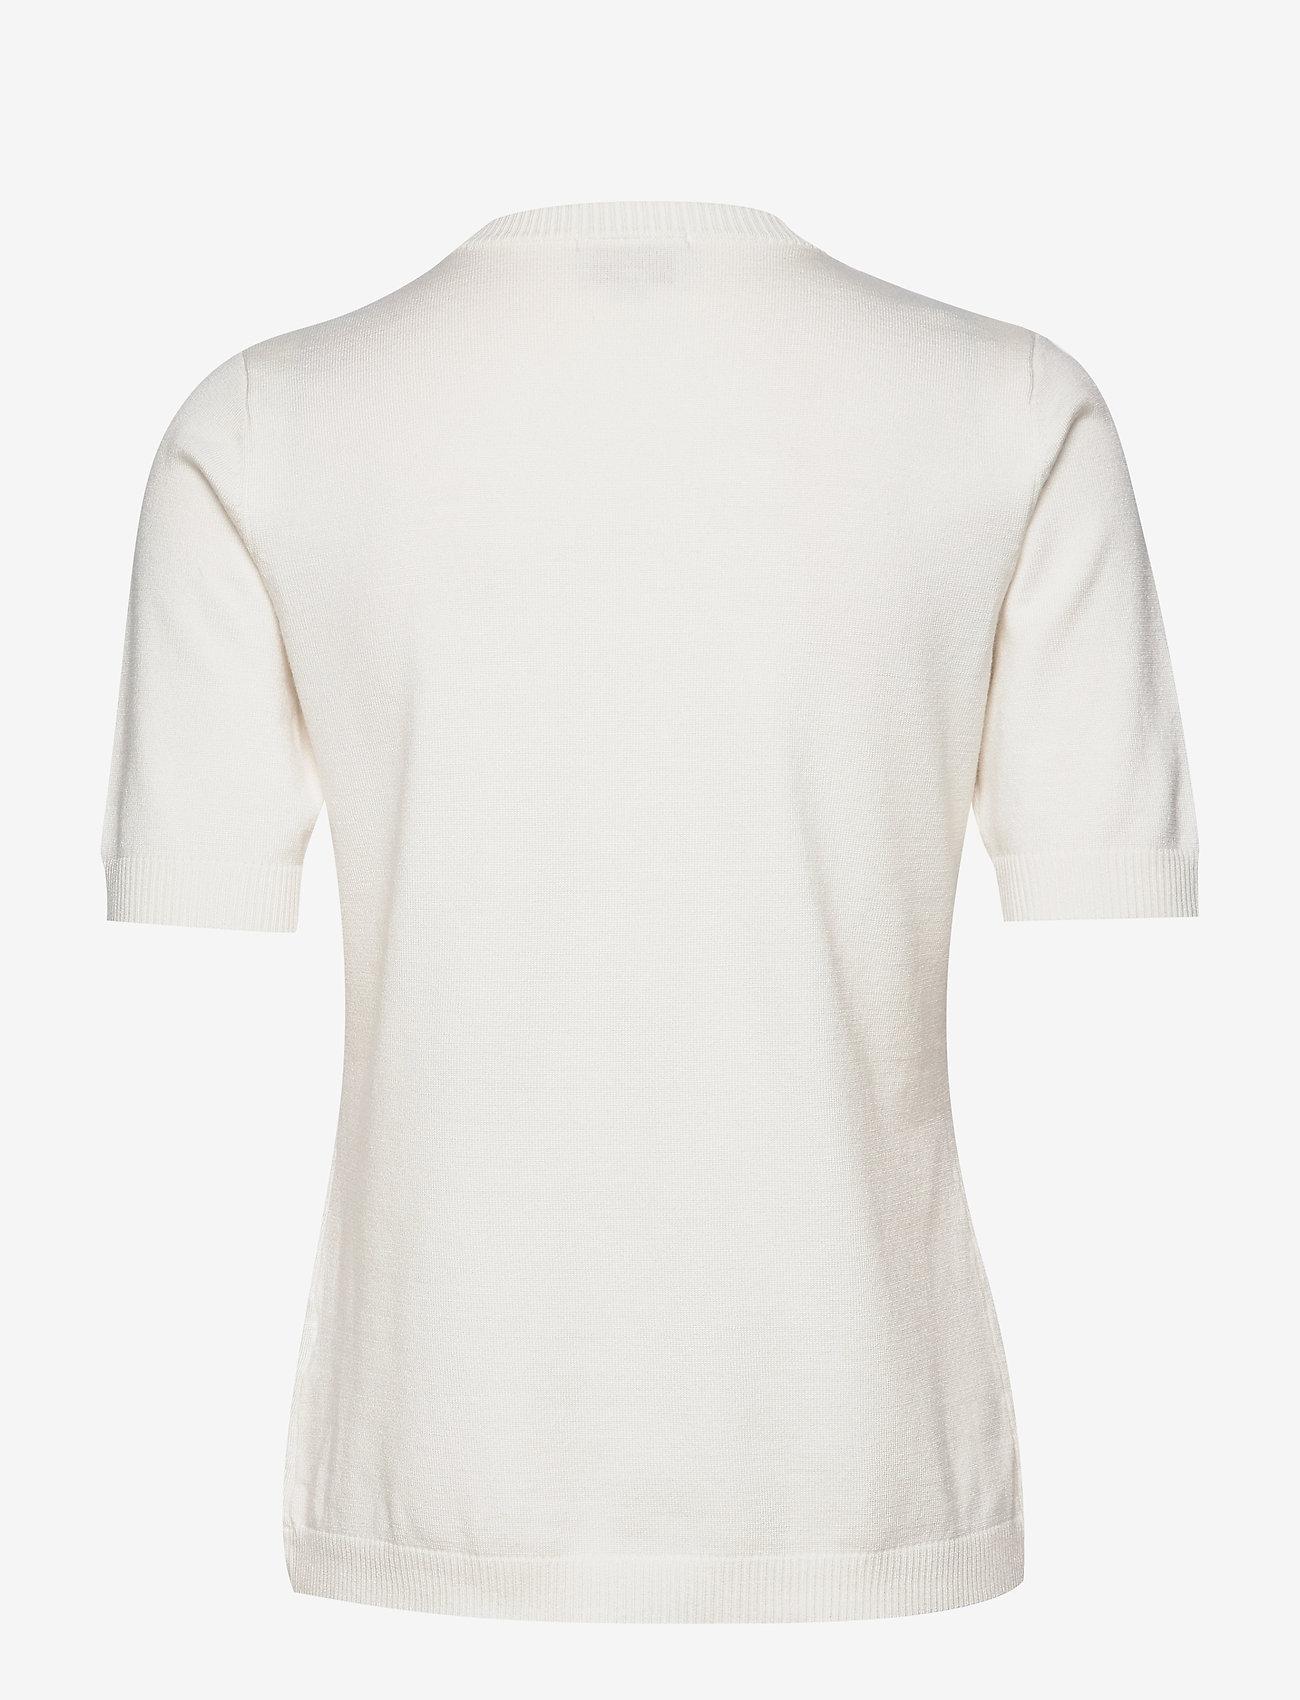 Minus - Pamela knit tee - gebreide t-shirts - broken white - 1